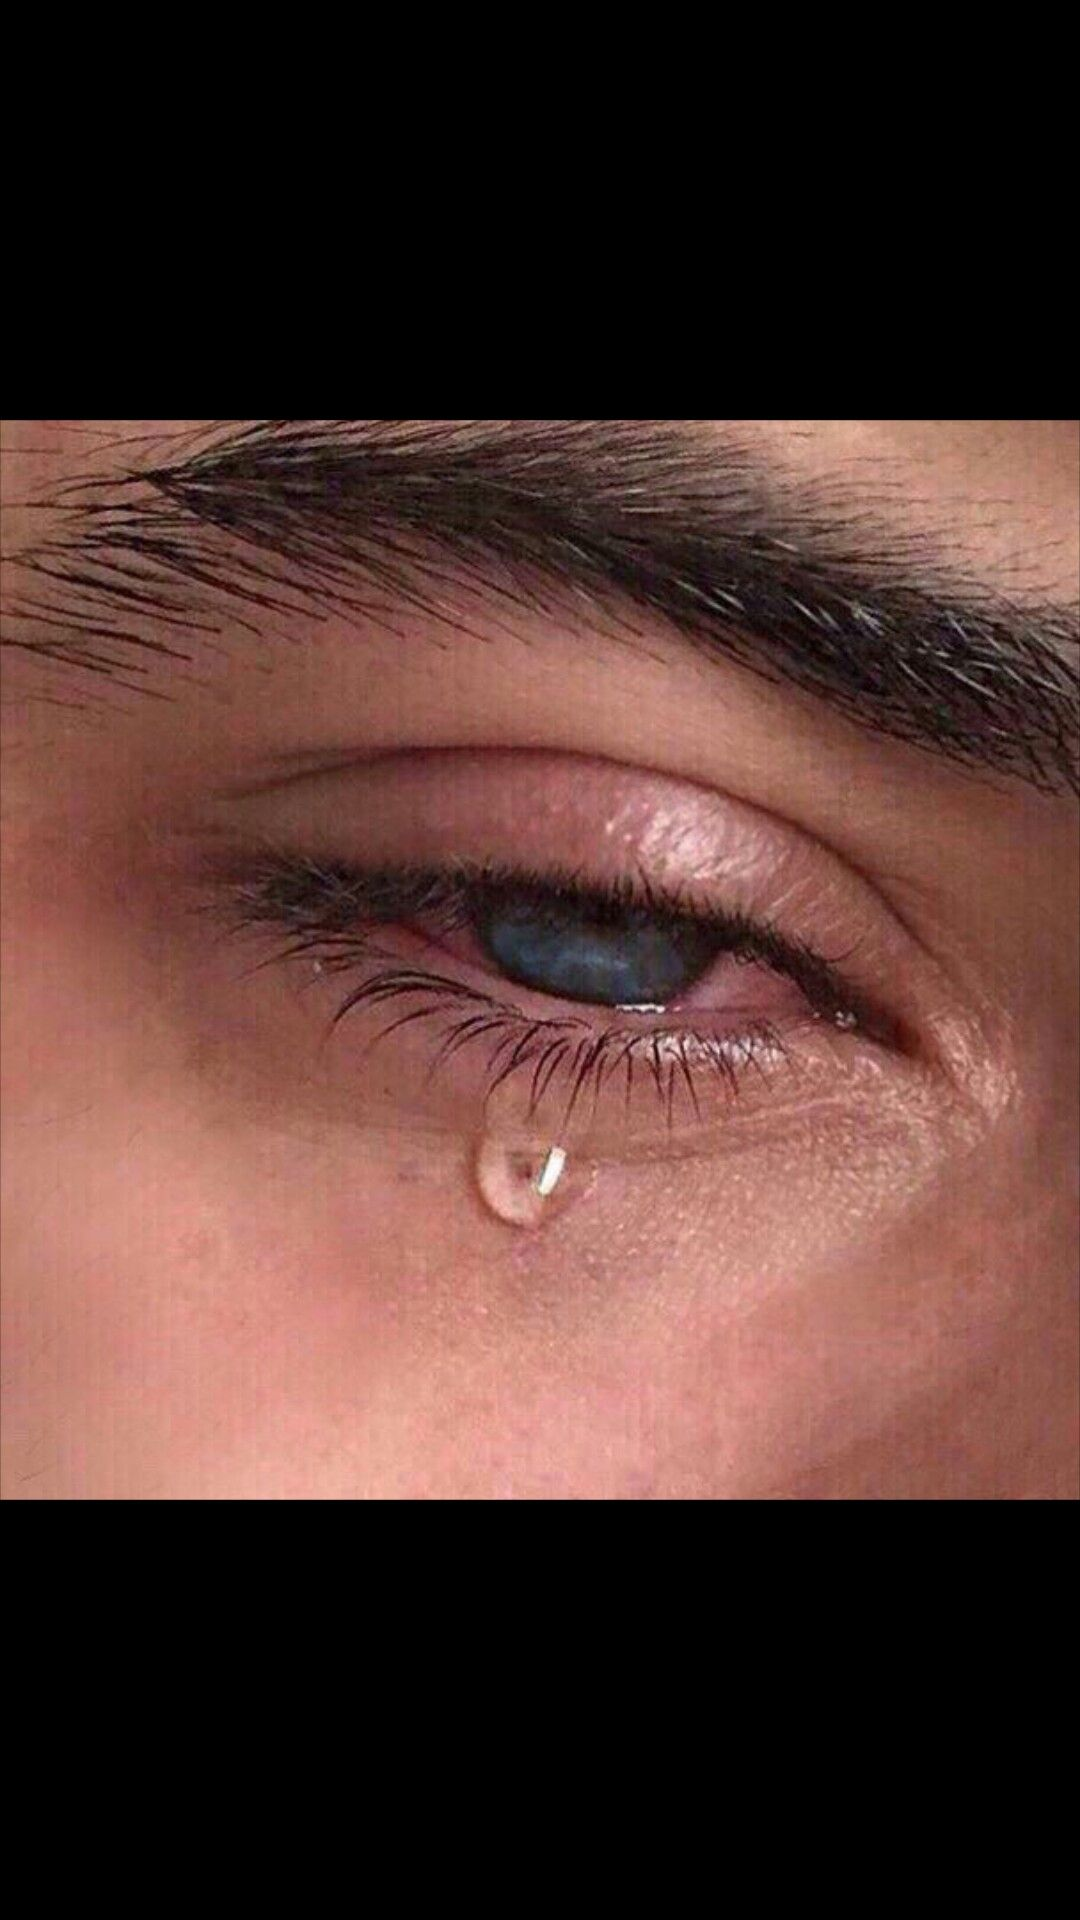 Pin By Mohammad Alwatyfy On Sfondi Crying Photography Aesthetic Eyes Eye Photography